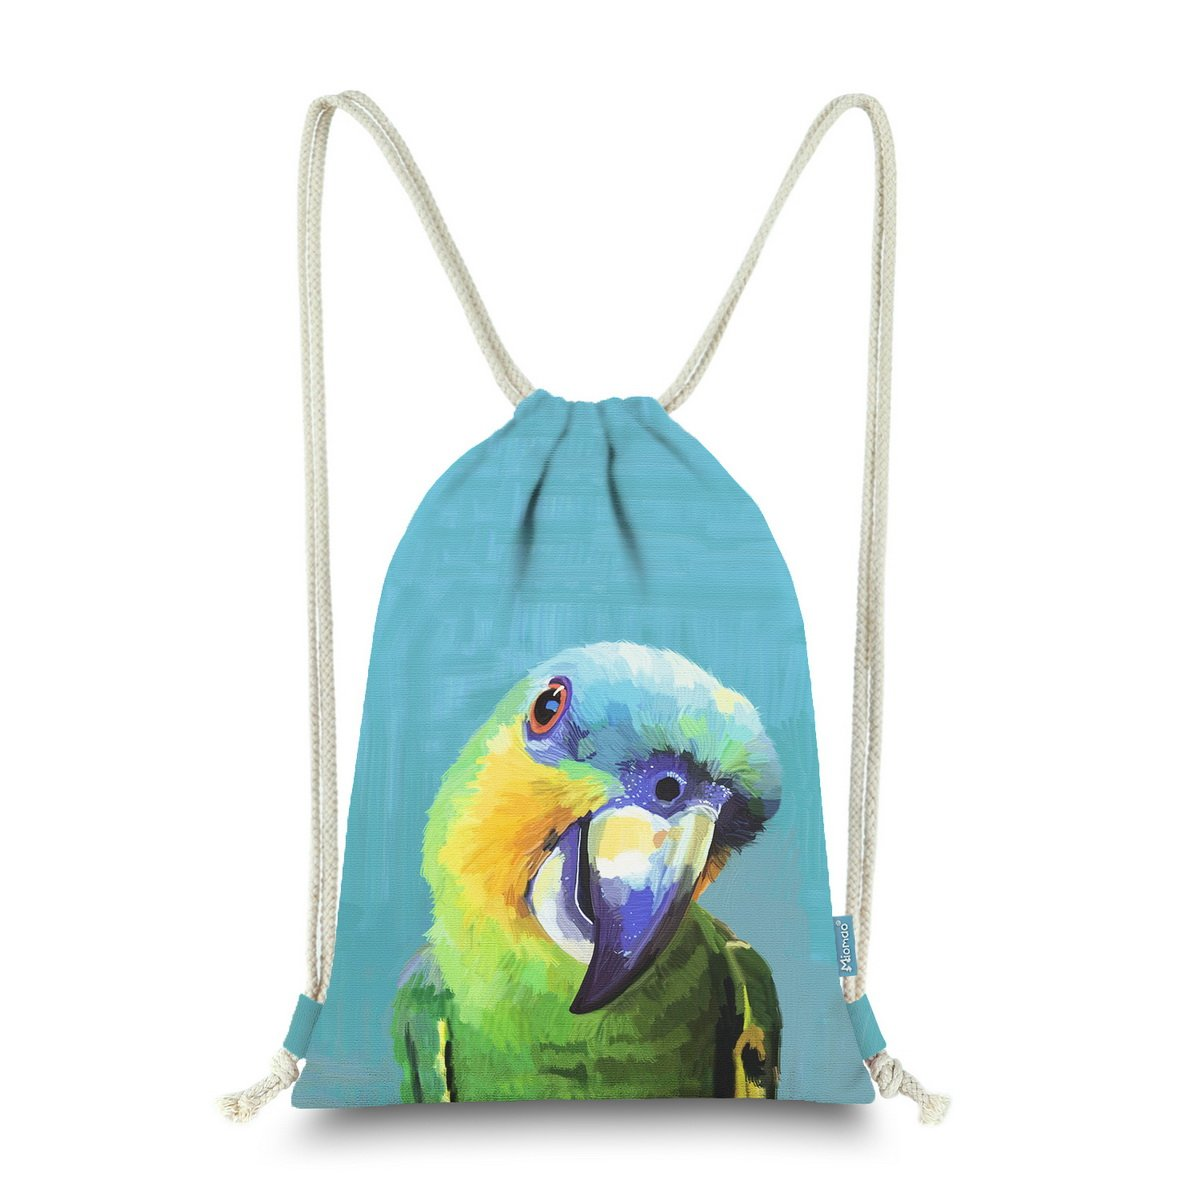 Miomao Drawstring Backpack Cute Parrot String Bag Bird Cinch Sack Animal Sinch Sack Sport Gym Sack Pack For Girl Boy Teen Kids 13 X 18 Inches Buffon's Macaw